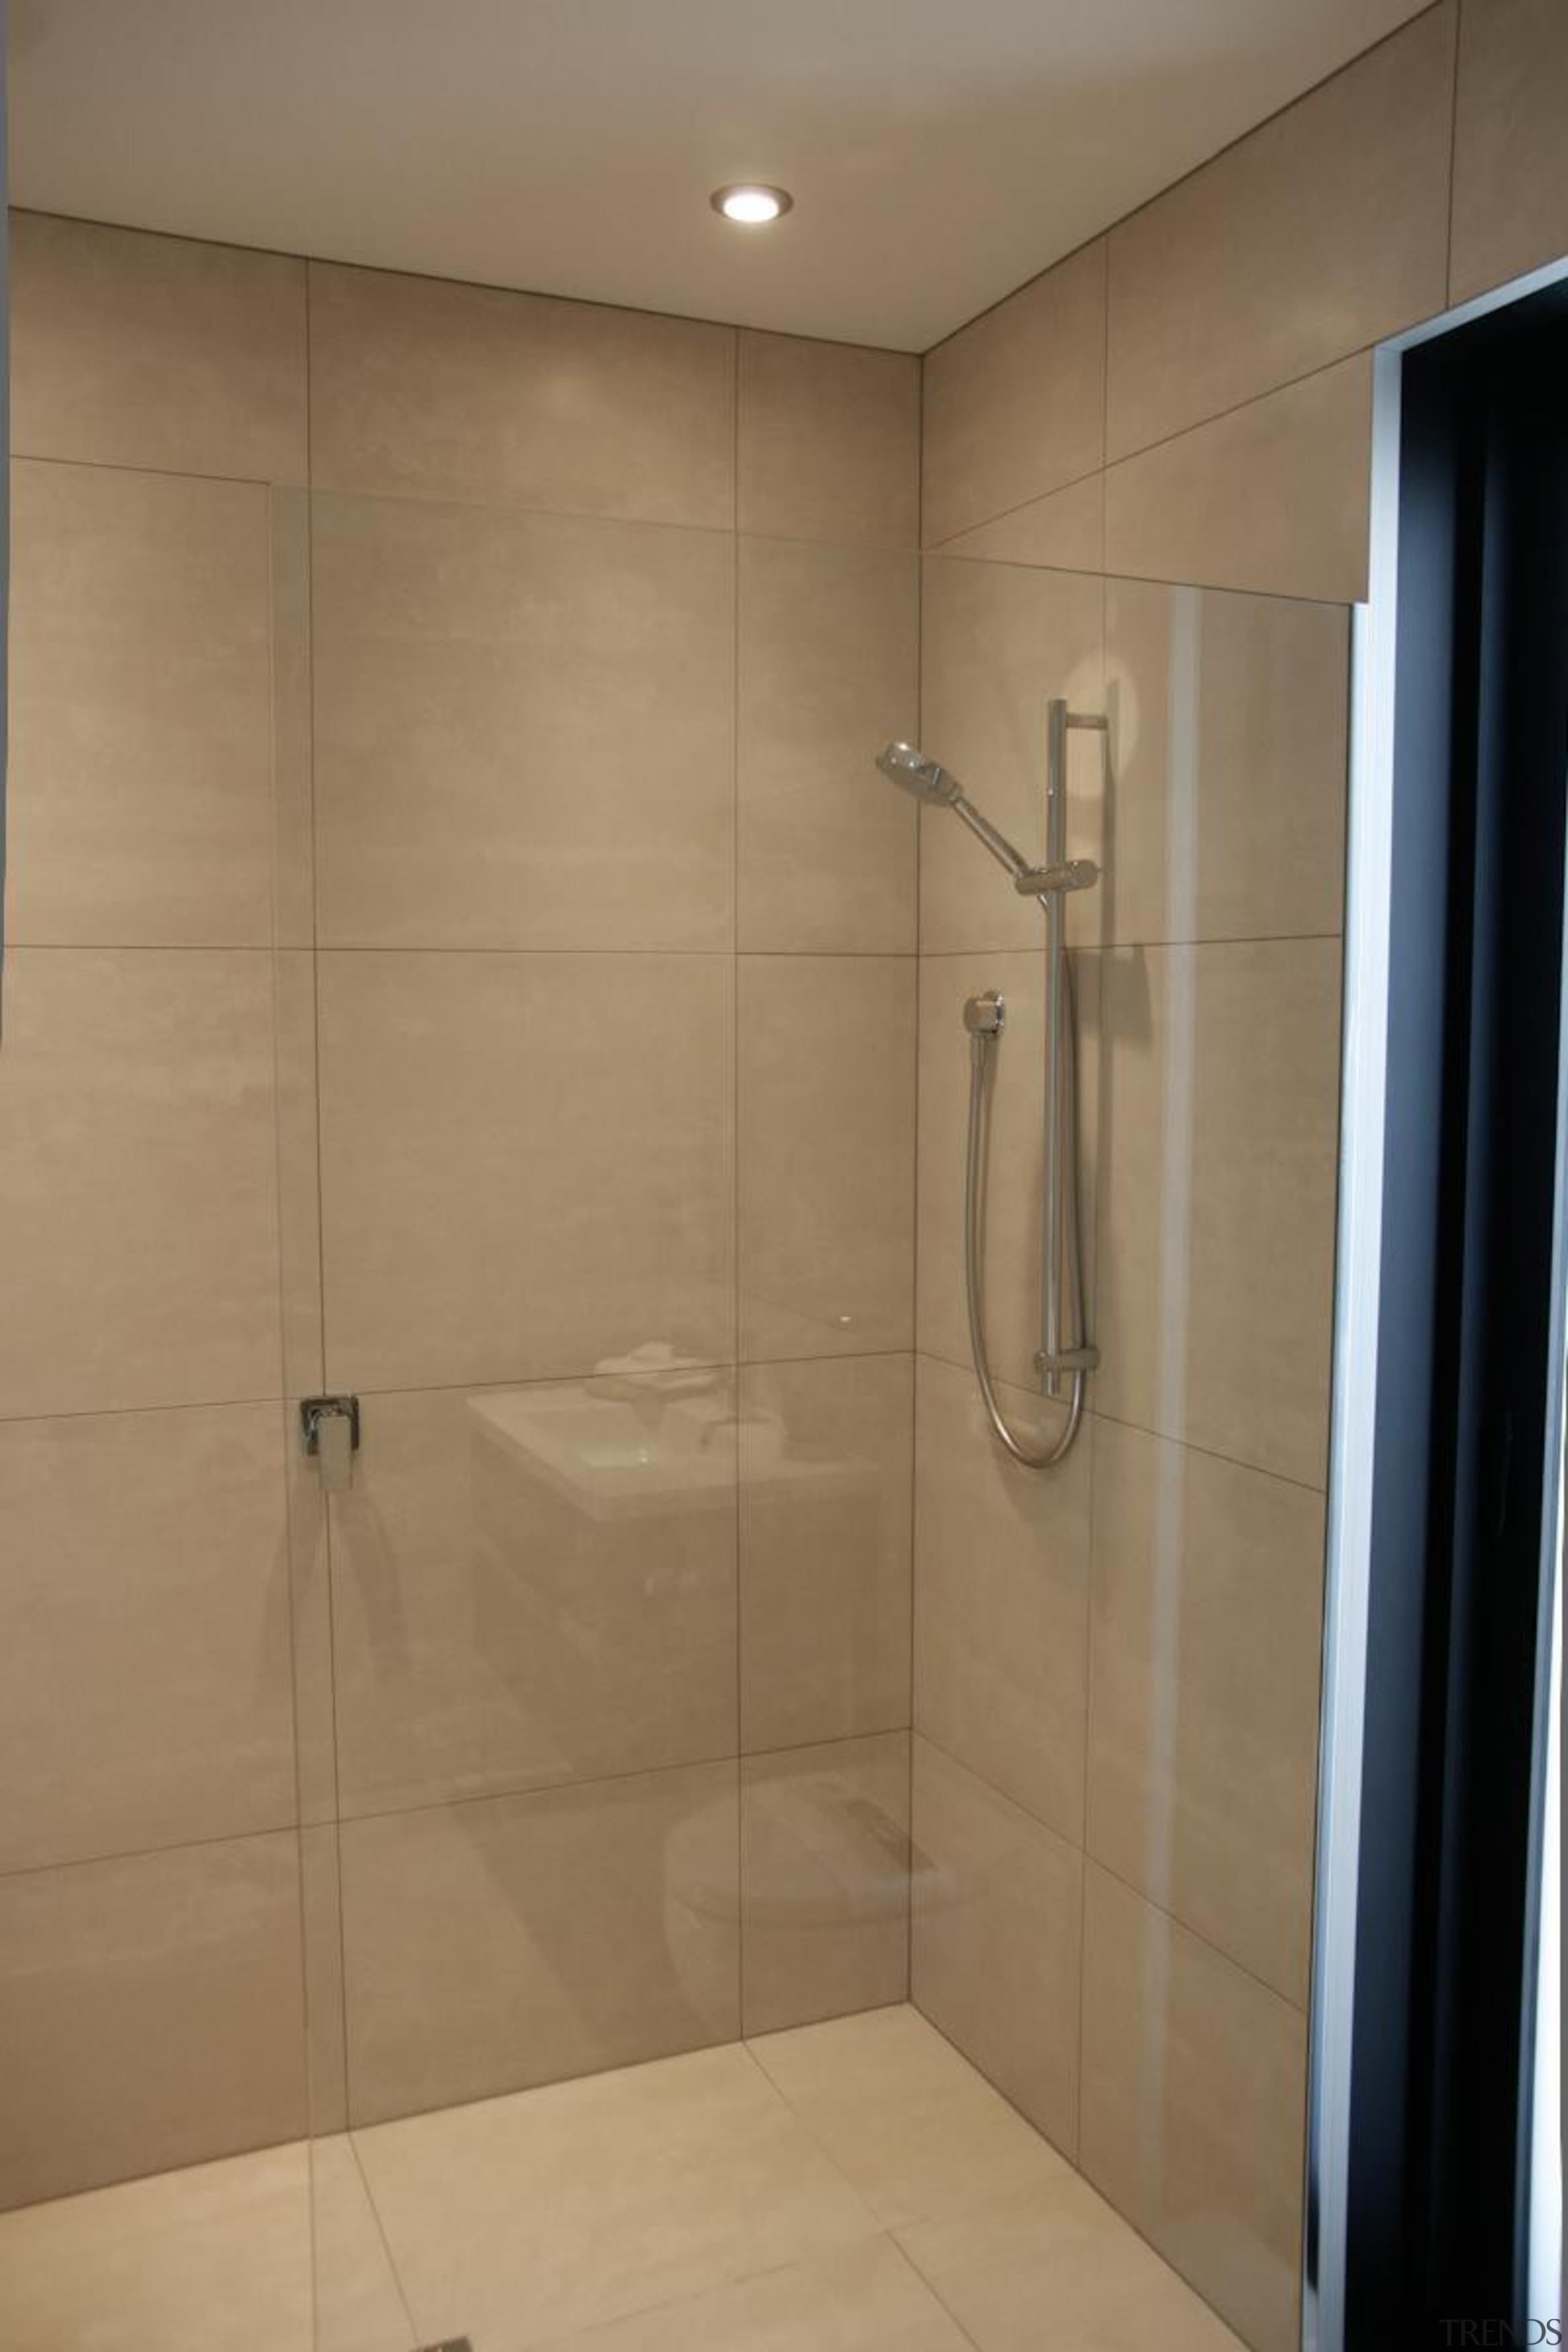 Earthstone talc ivory porcelain tiled shower - Earthstone bathroom, floor, plumbing fixture, room, shower, tile, brown